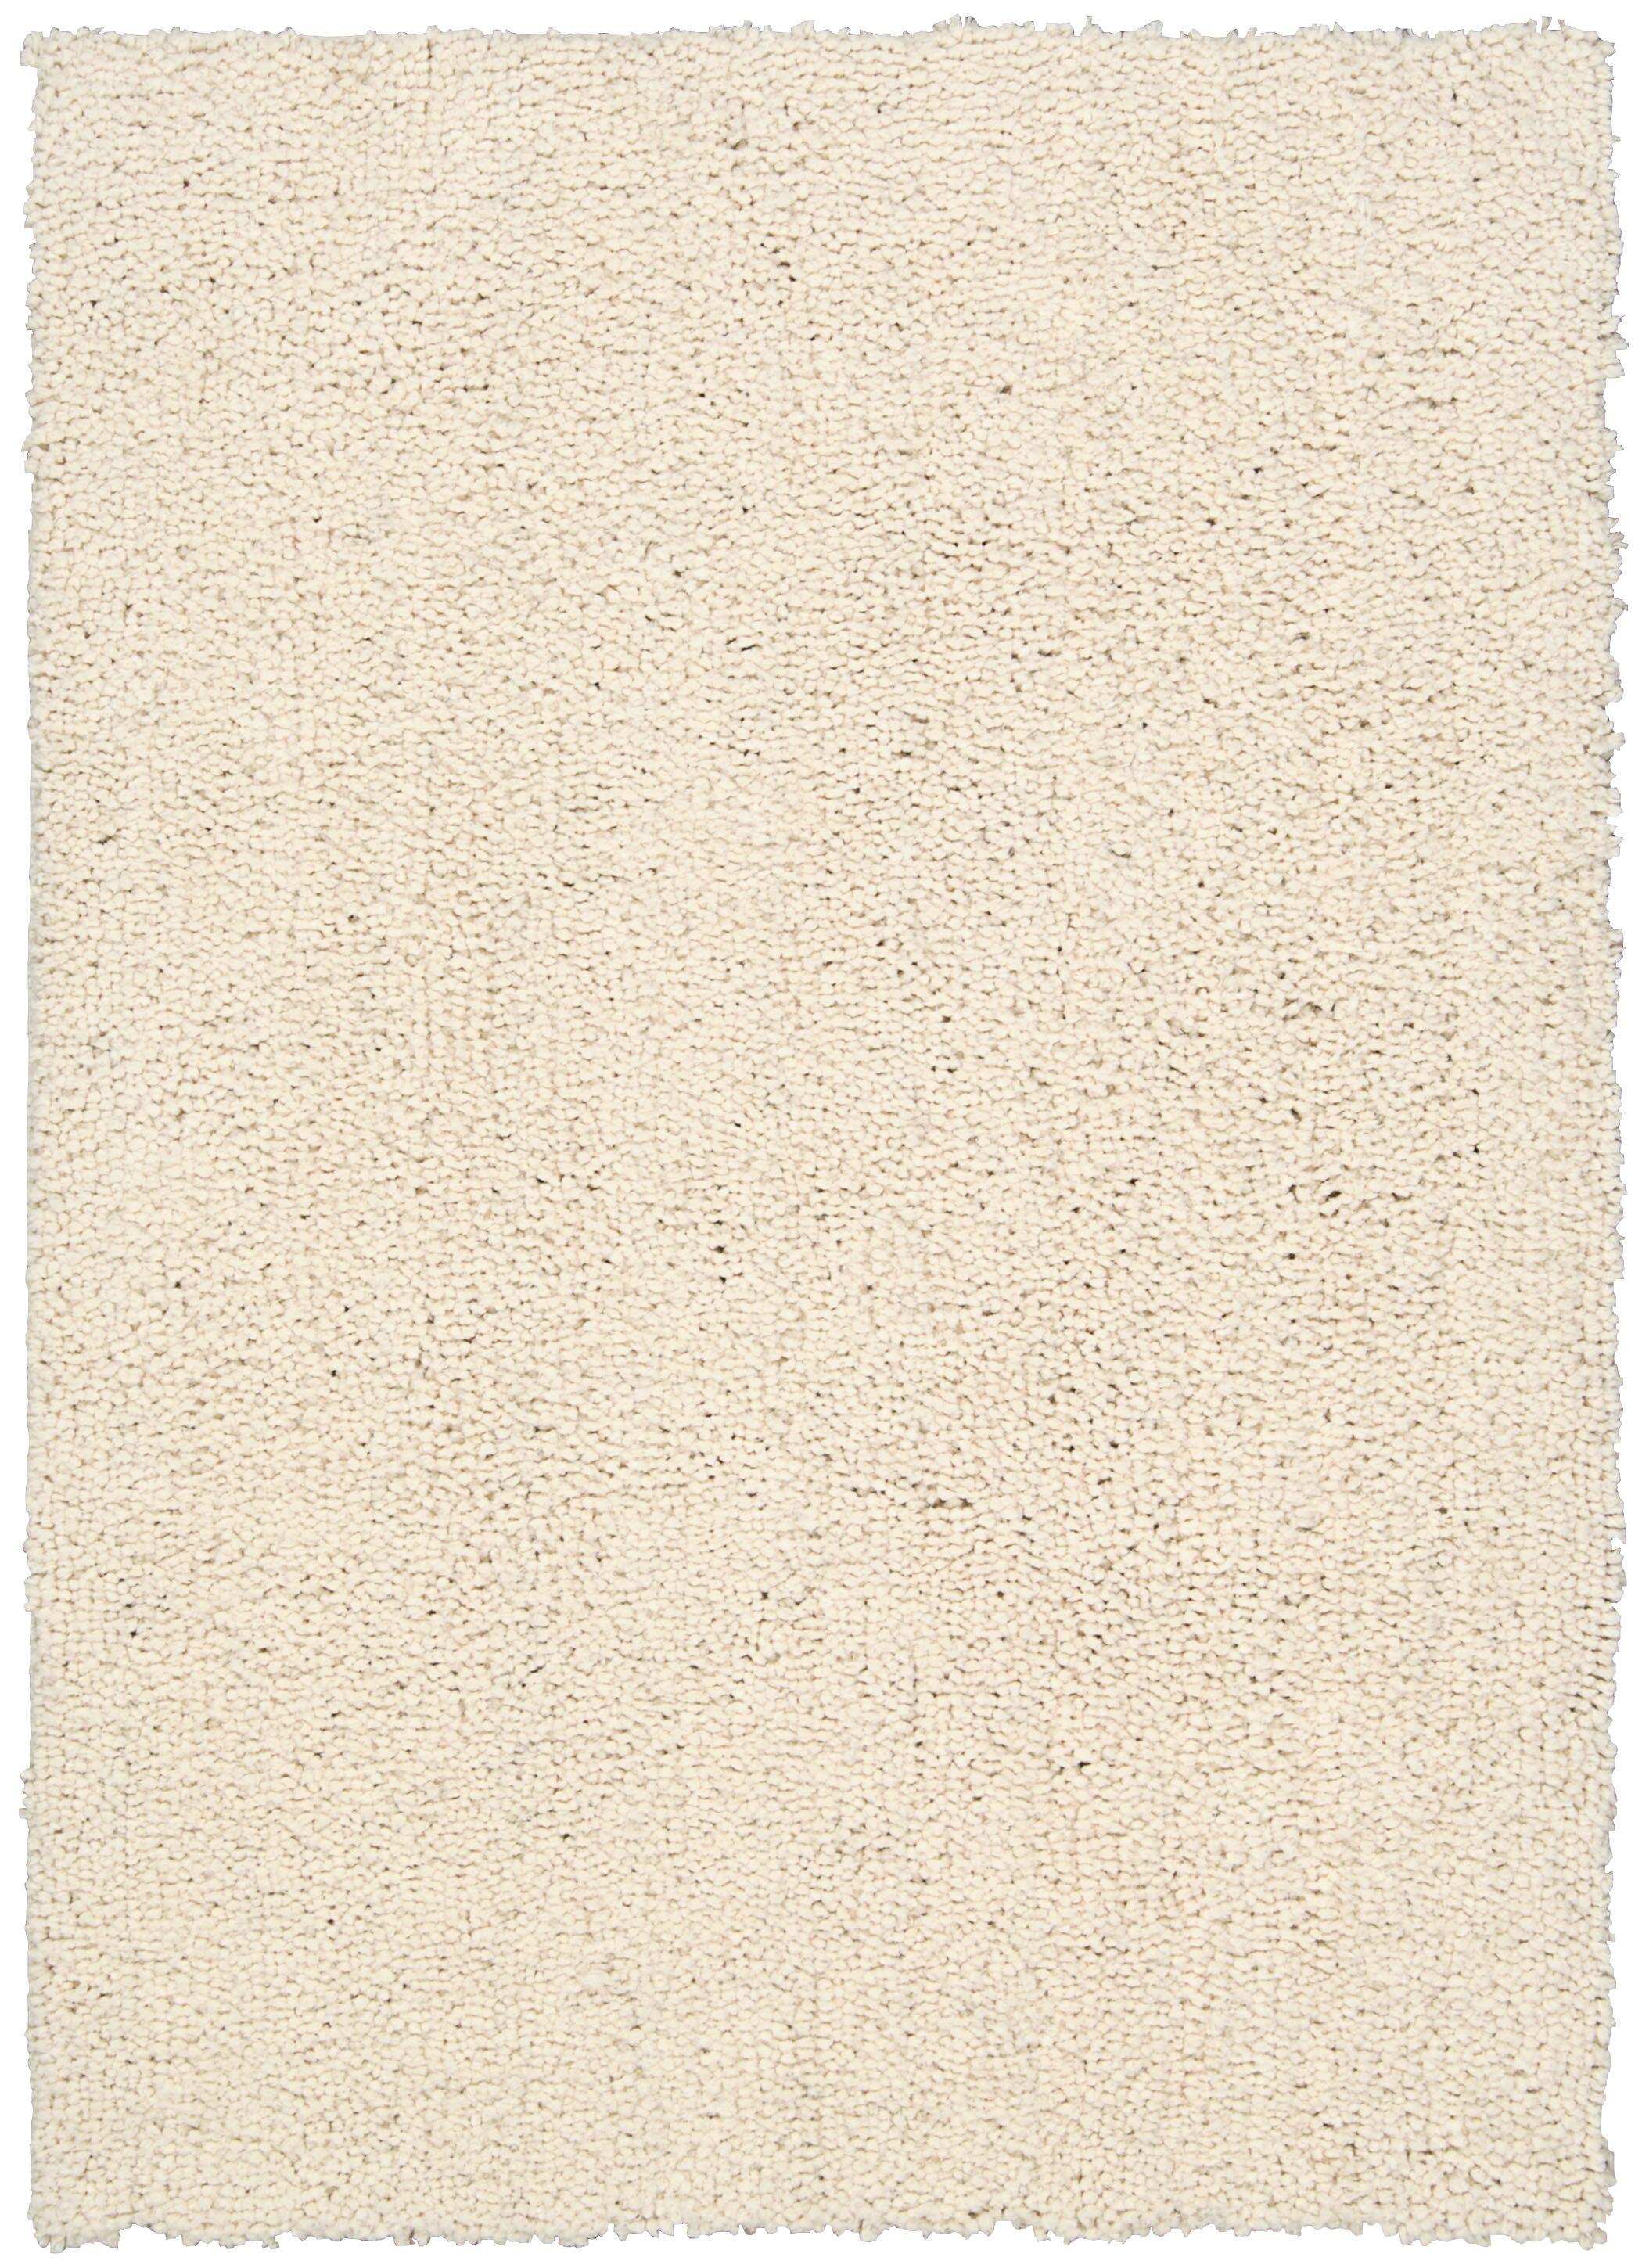 Puli Hand-Woven Loc Ecru Area Rug Rug Size: Rectangle 5' x 7'